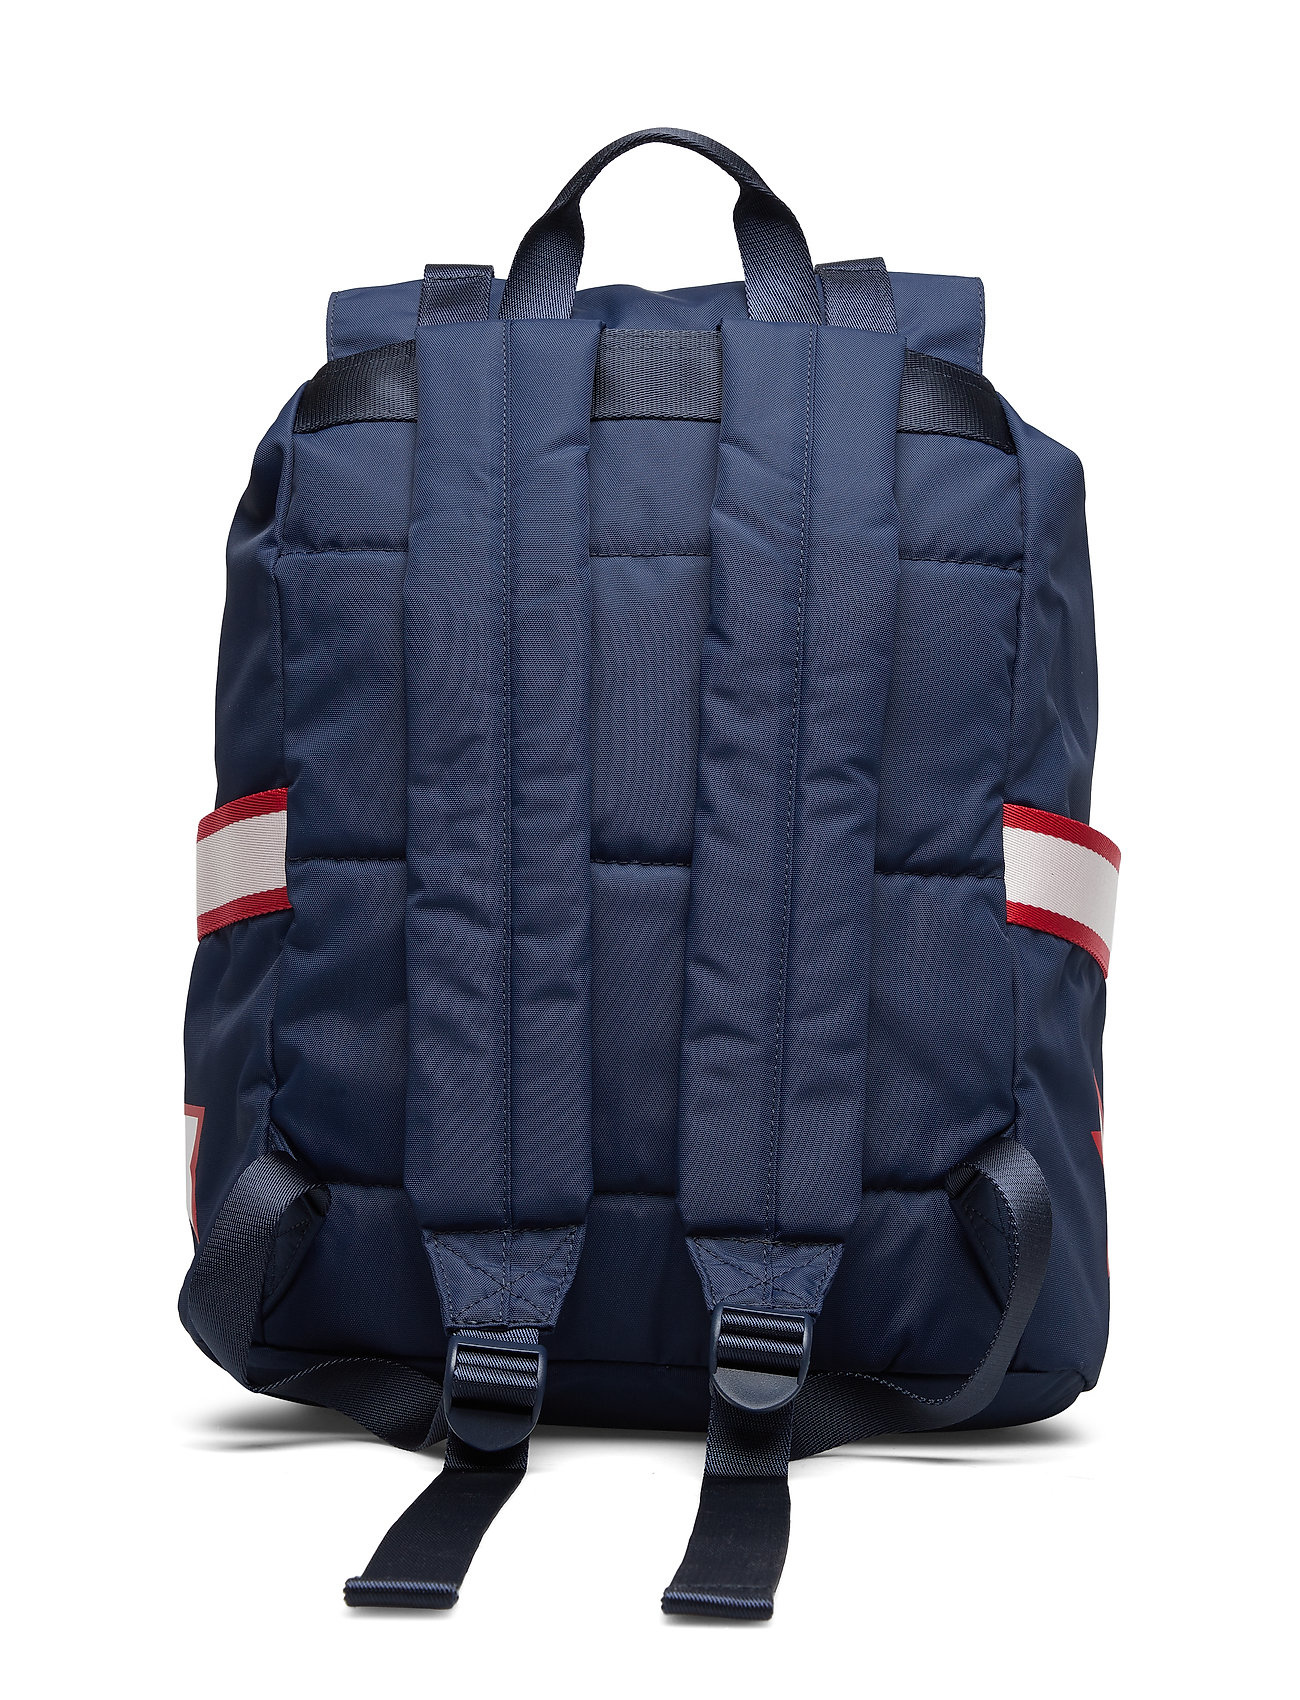 Tommy Hilfiger Lifestyle Rugzak, blauw/wit/rood